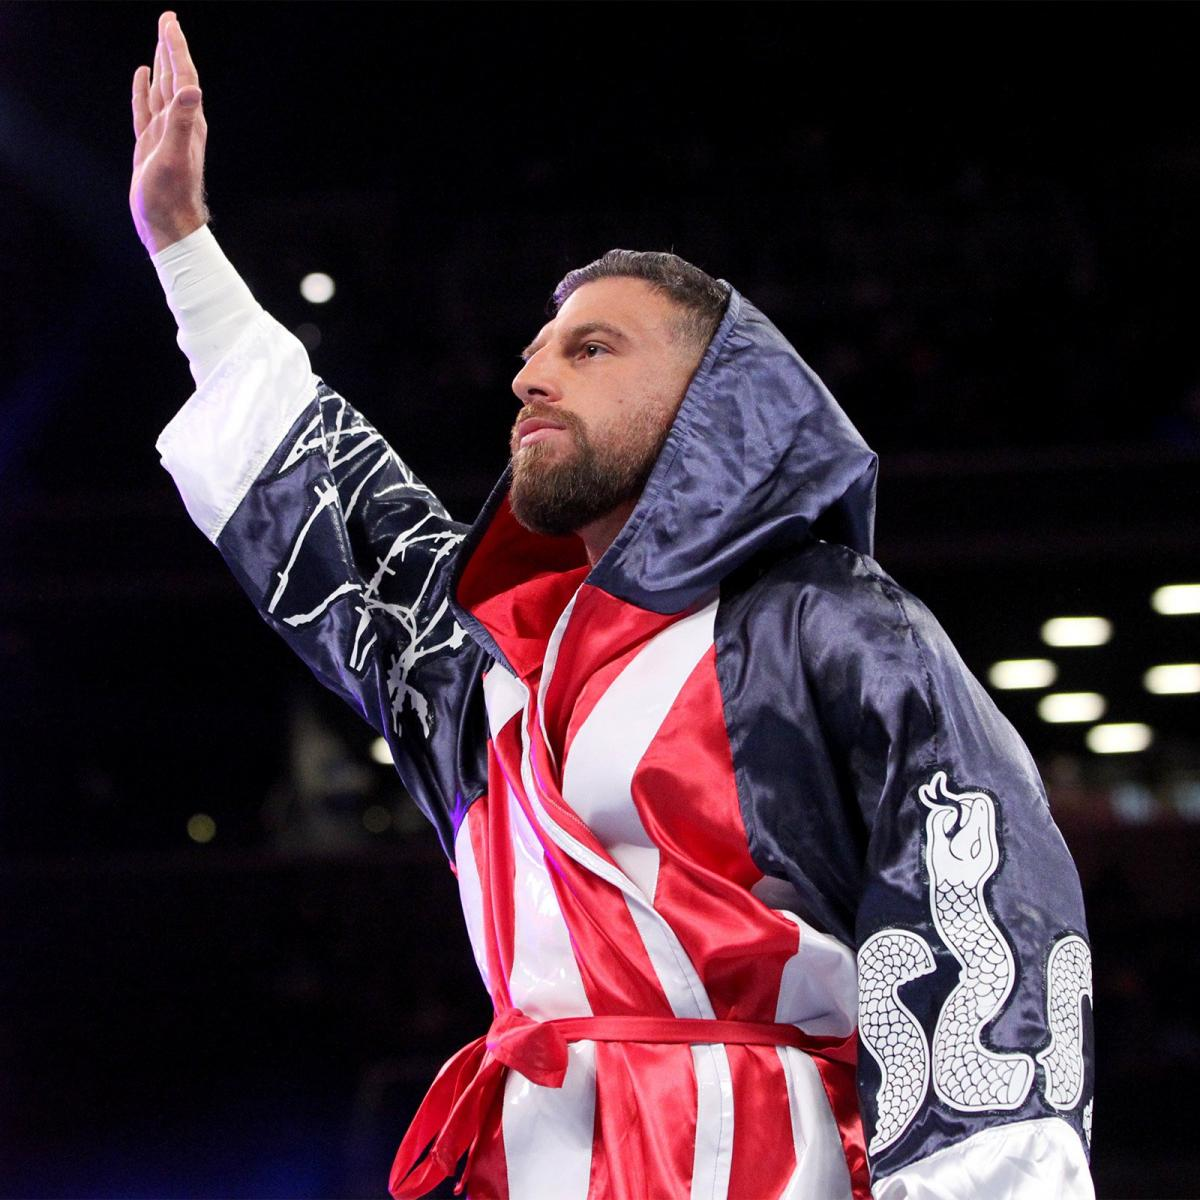 Drew Gulak habla de John Cena Drew Gulak podría debutar en AEW